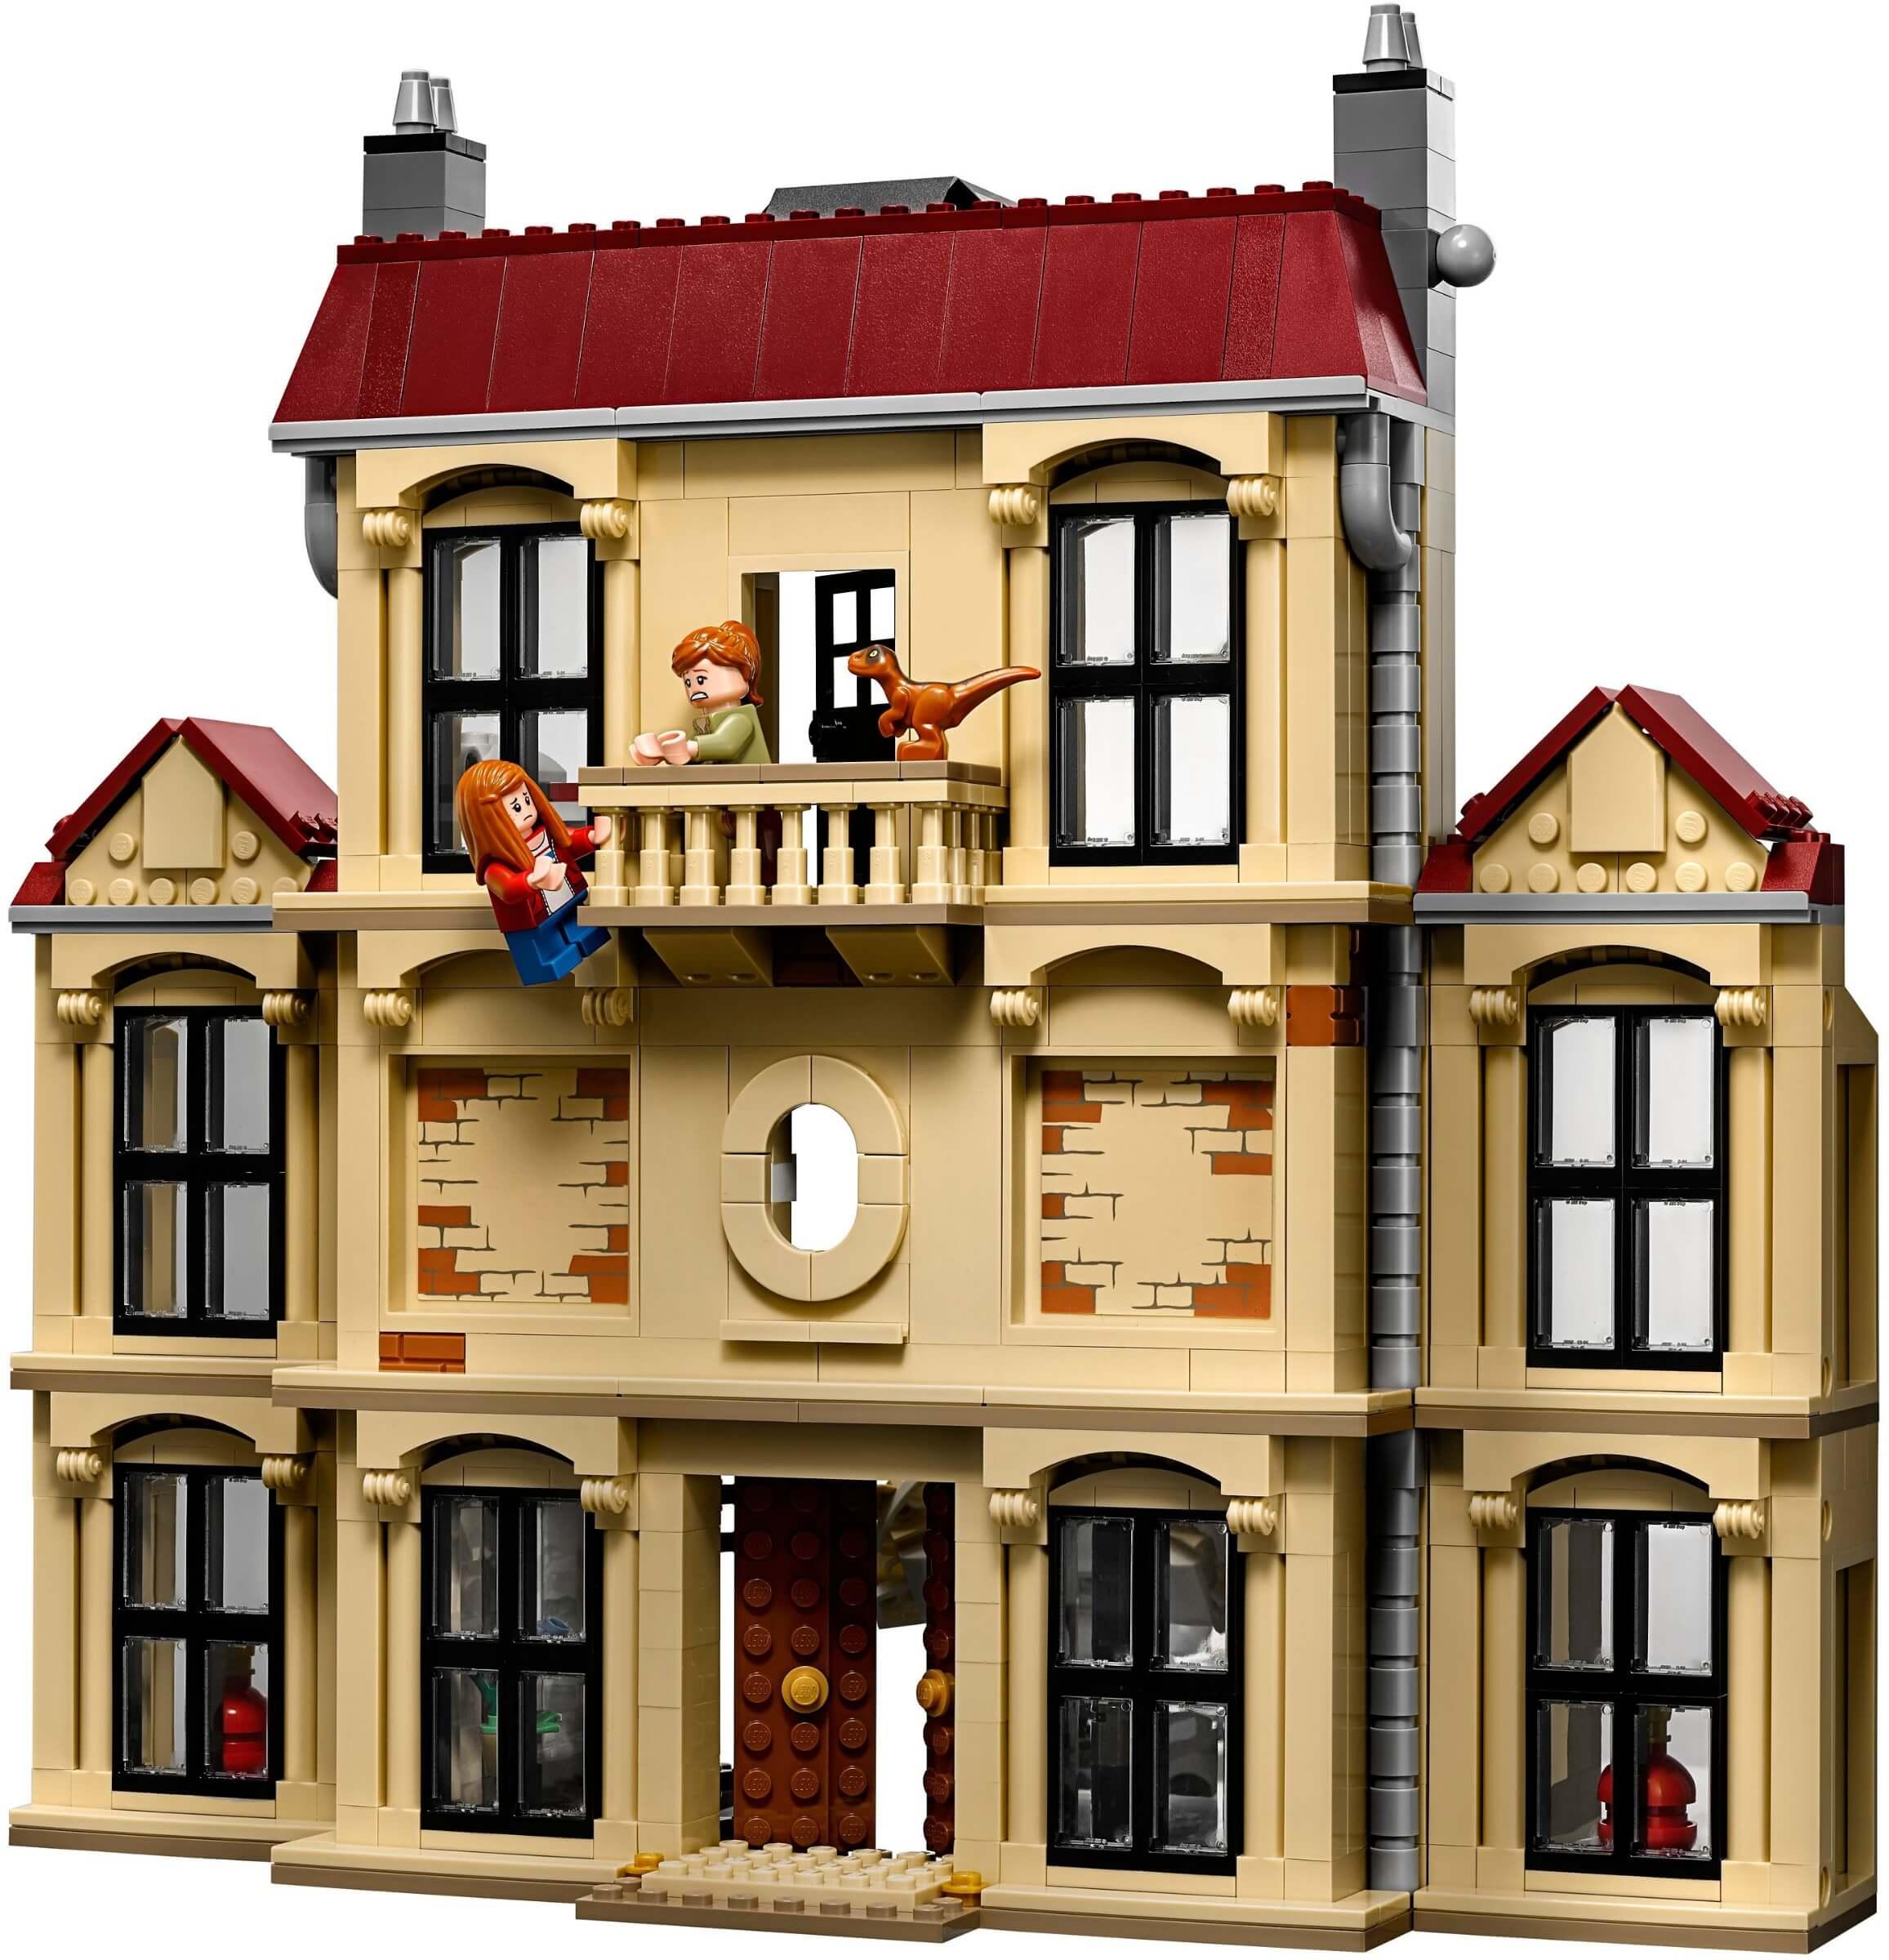 Mua đồ chơi LEGO 75930 - LEGO Khủng Long Jurassic World 75930 - Khủng Long Đen Indoraptor tấn công Biệt Thự Lockwood (LEGO 75930 Indoraptor Rampage at Lockwood Estate)